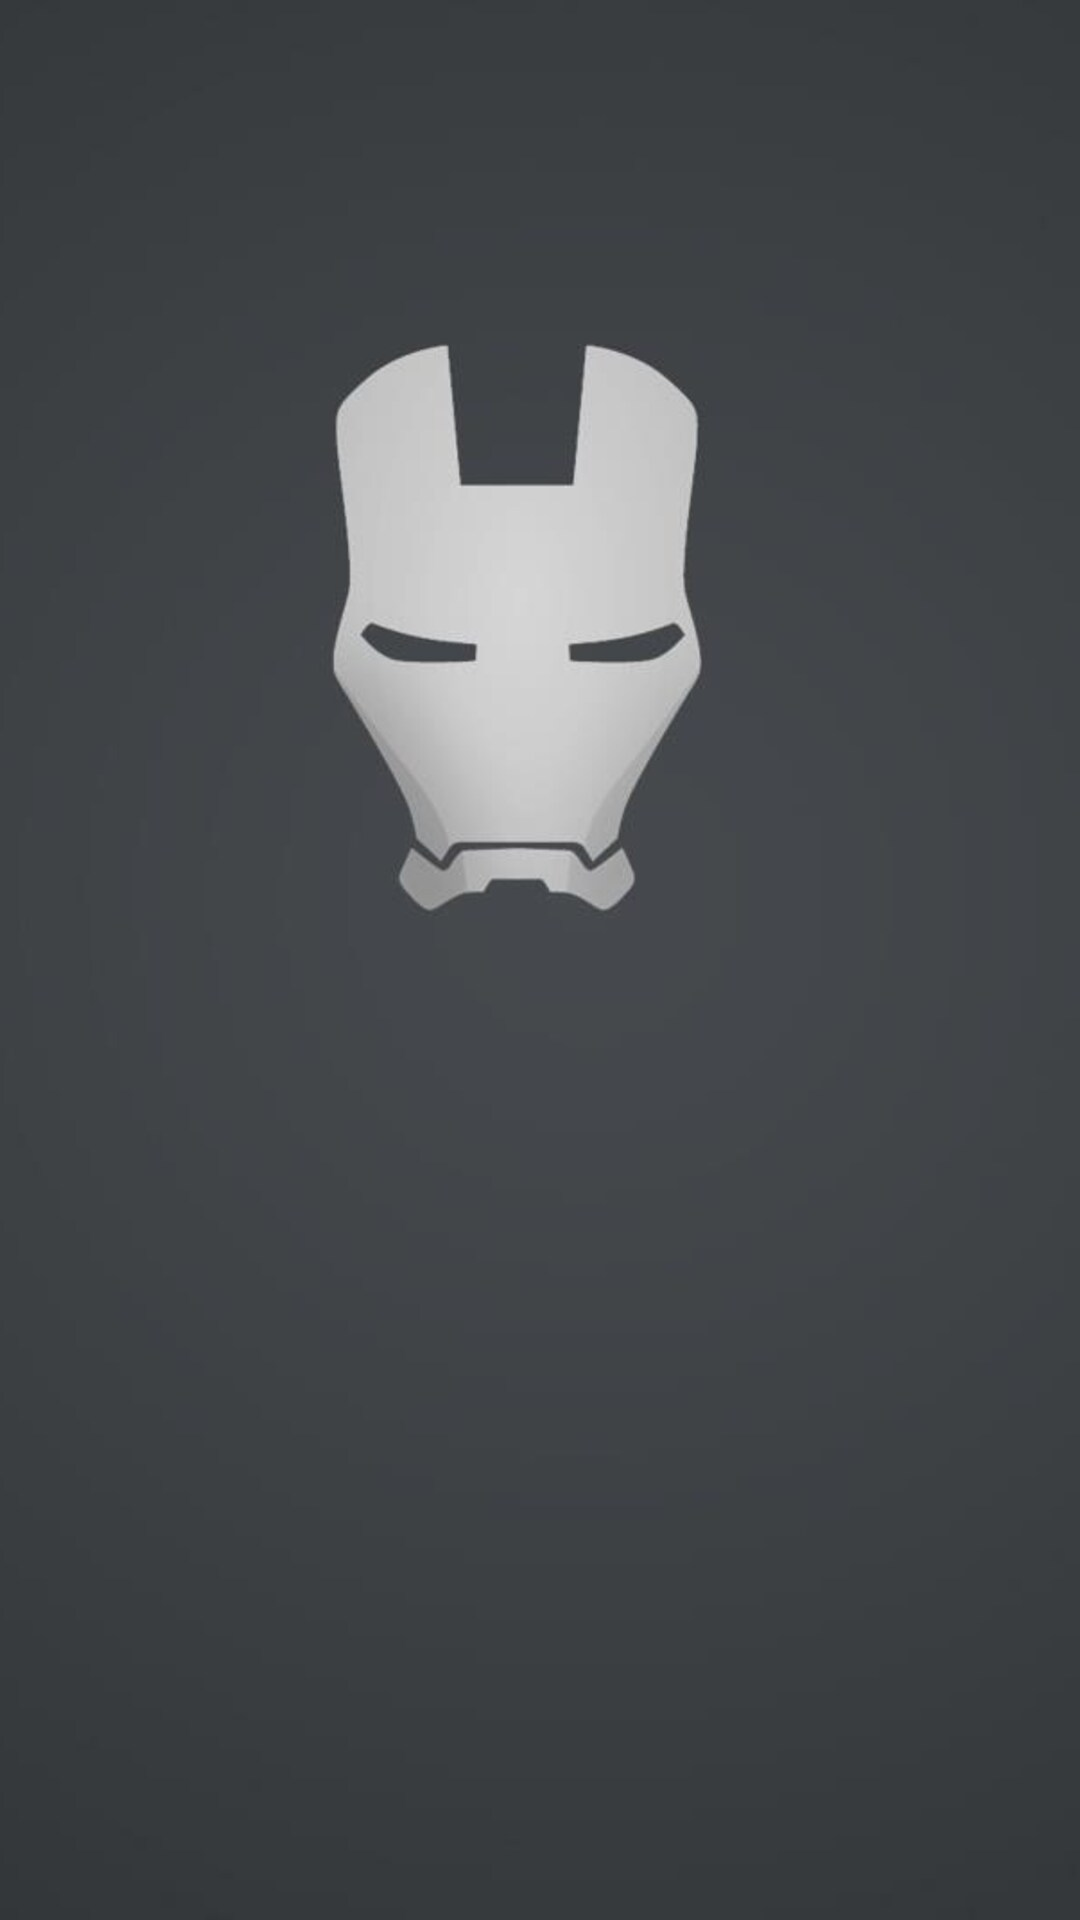 1080x1920 Iron Man Simple 3 Iphone 7 6s 6 Plus Pixel Xl One Plus 3